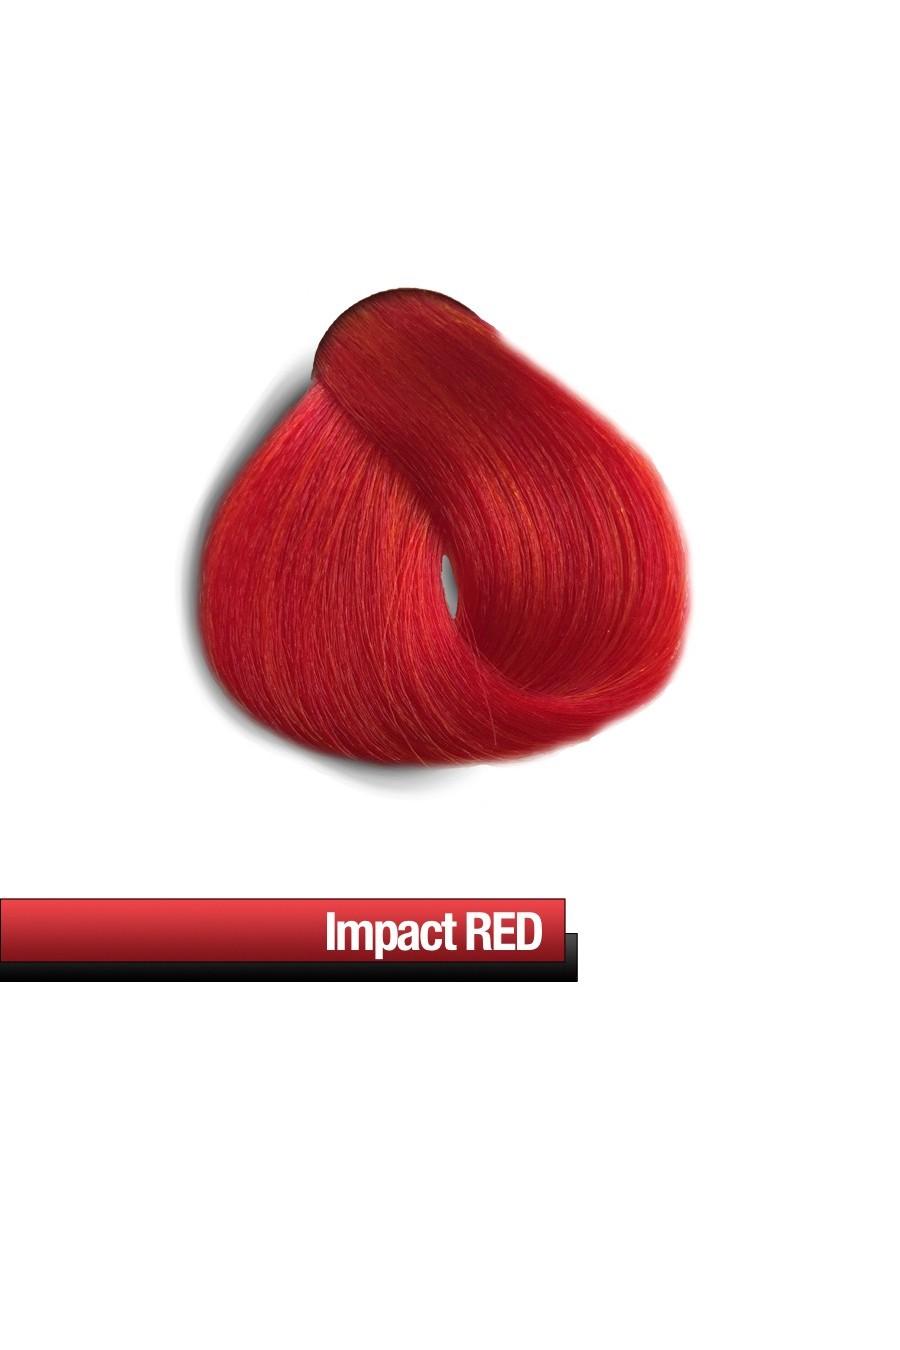 CREMA COLORE IMPACT RED RR